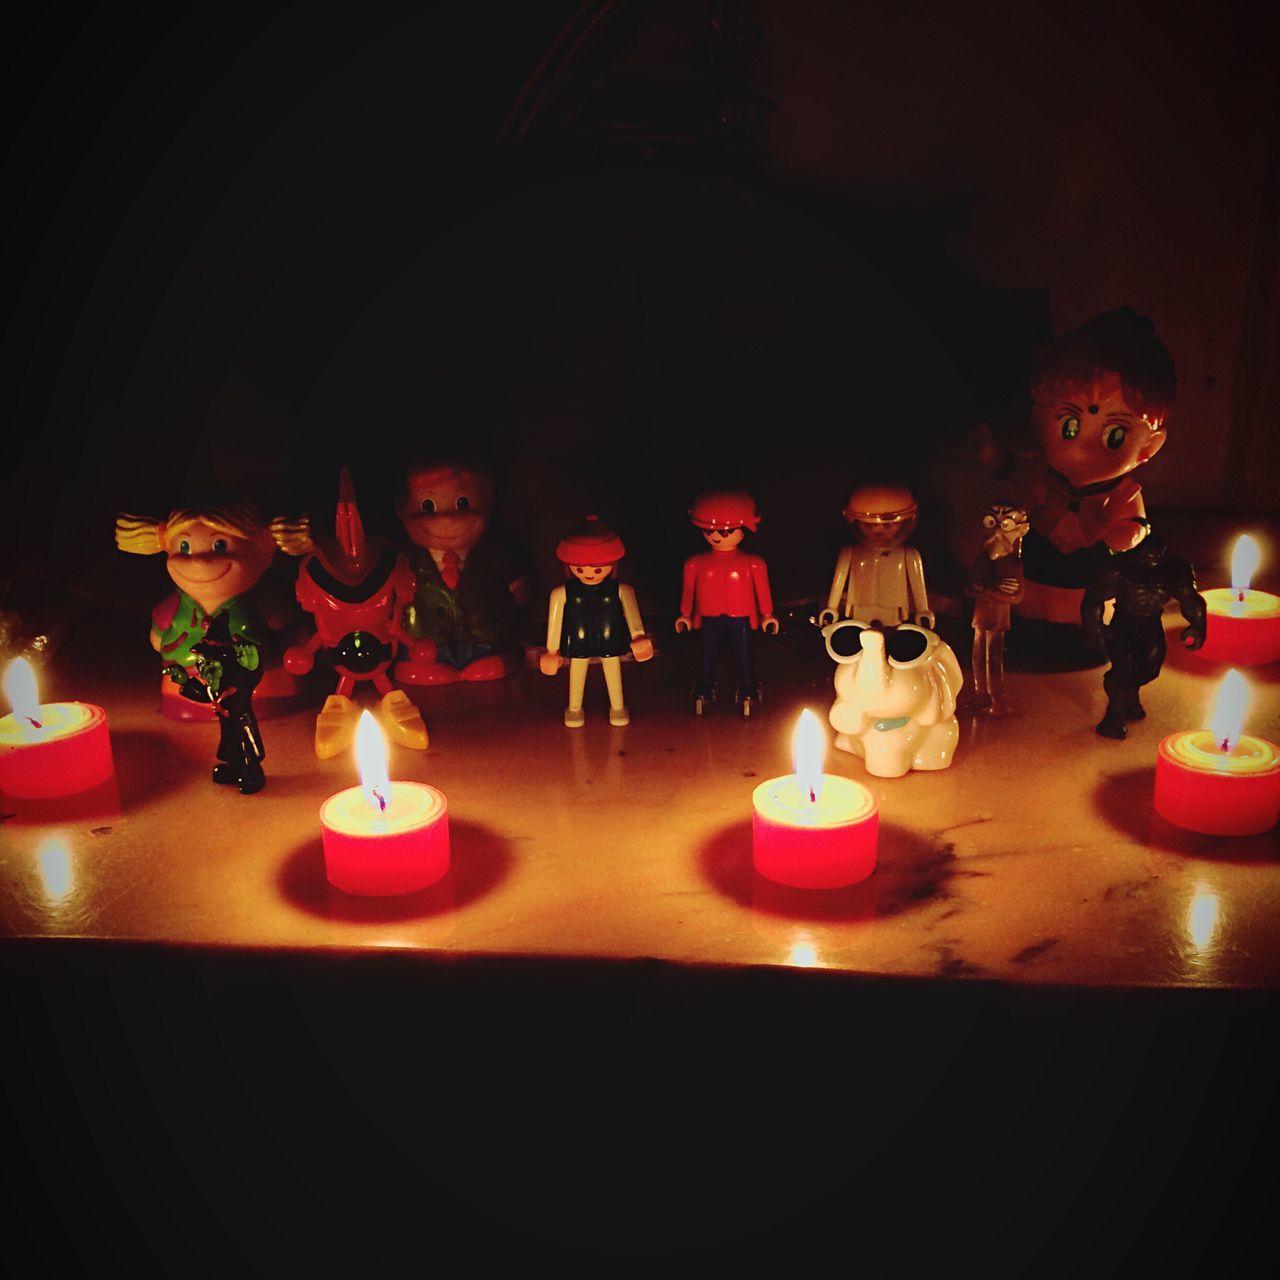 Candle Candlelight Flame Burning Illuminated Indoors  Table Lighting Equipment No People Tea Light Close-up Childhood Memories Childhood Toys EyeEm Gallery EyeEm Best Shots